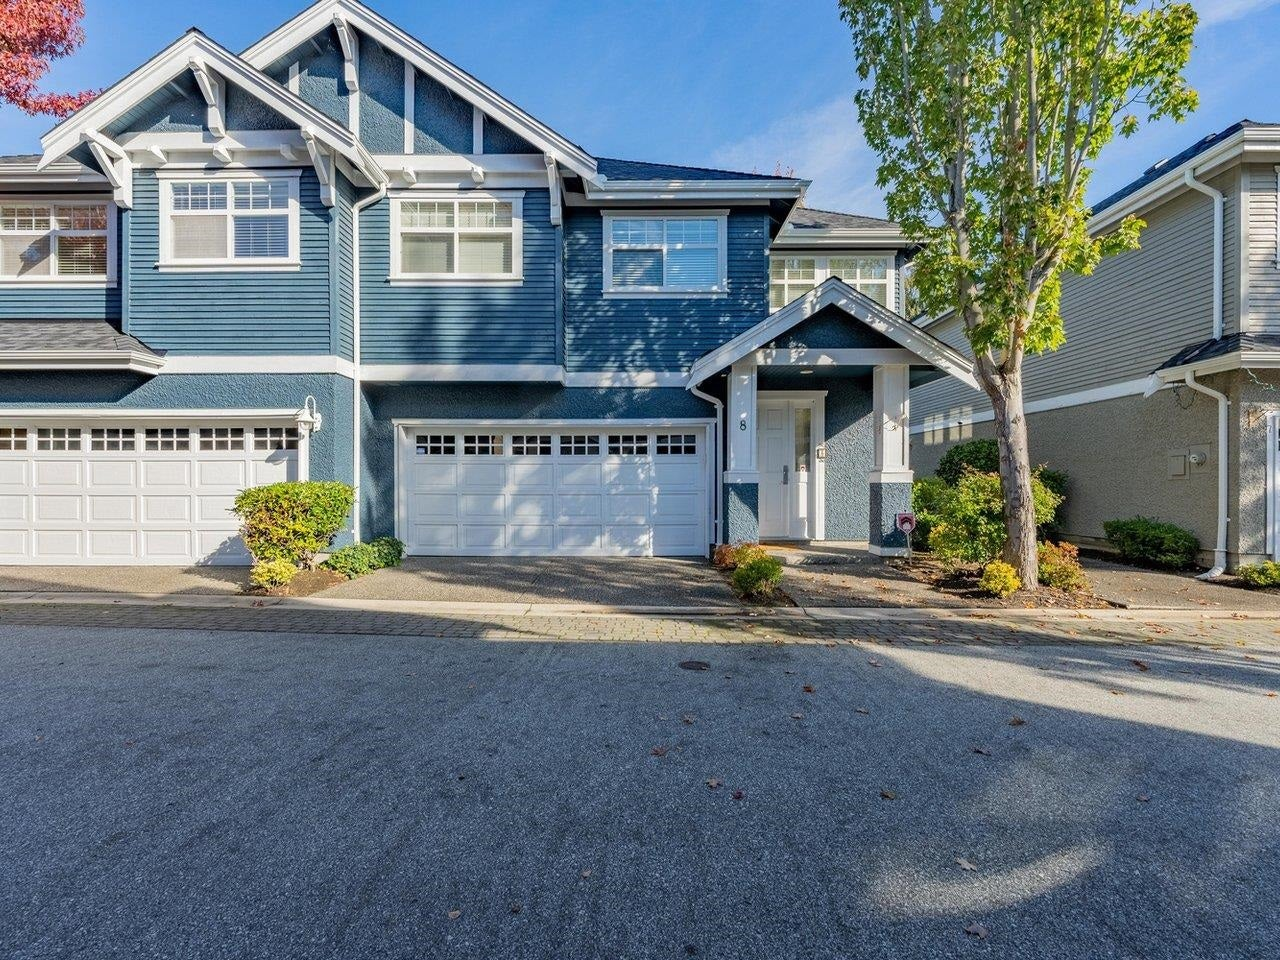 8 3591 GRANVILLE AVENUE - Terra Nova Townhouse for sale, 3 Bedrooms (R2621653)